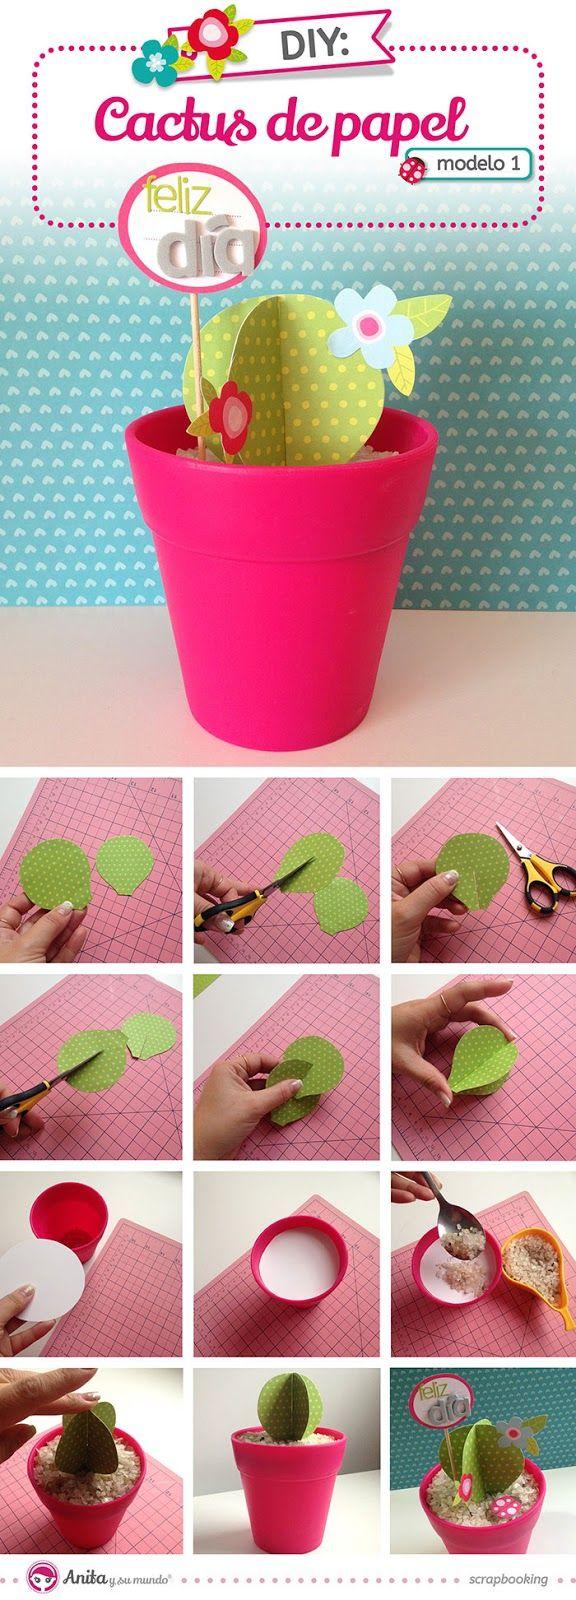 Cactus de papel - Caroli Schulz para @anitaysumundo